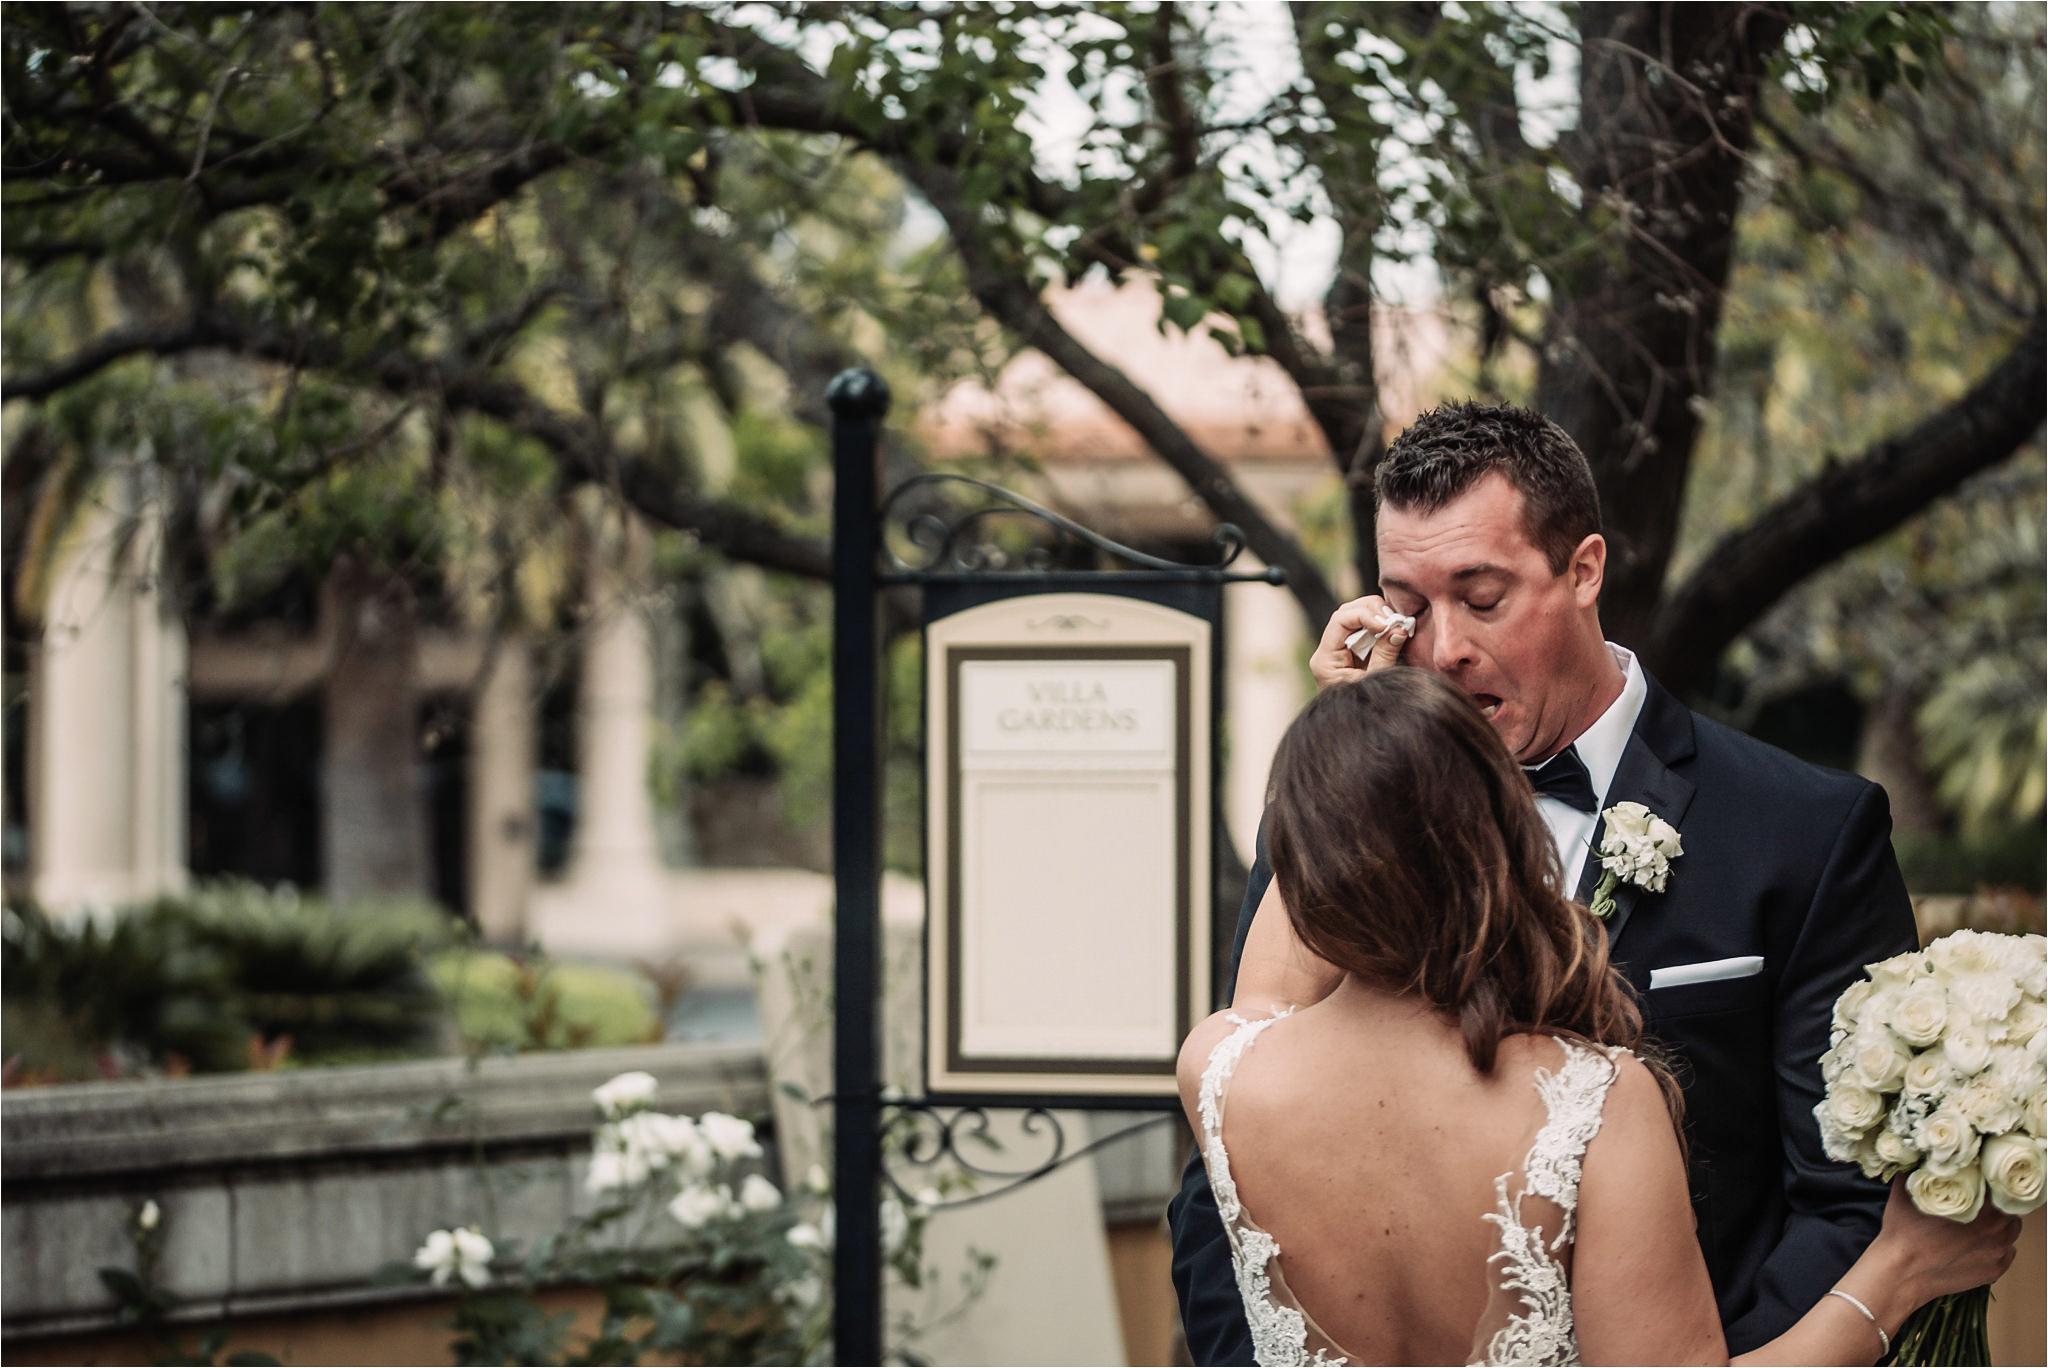 jessica-roman-photography-arden hills wedding photograpger-sacramento-boise-12.jpg